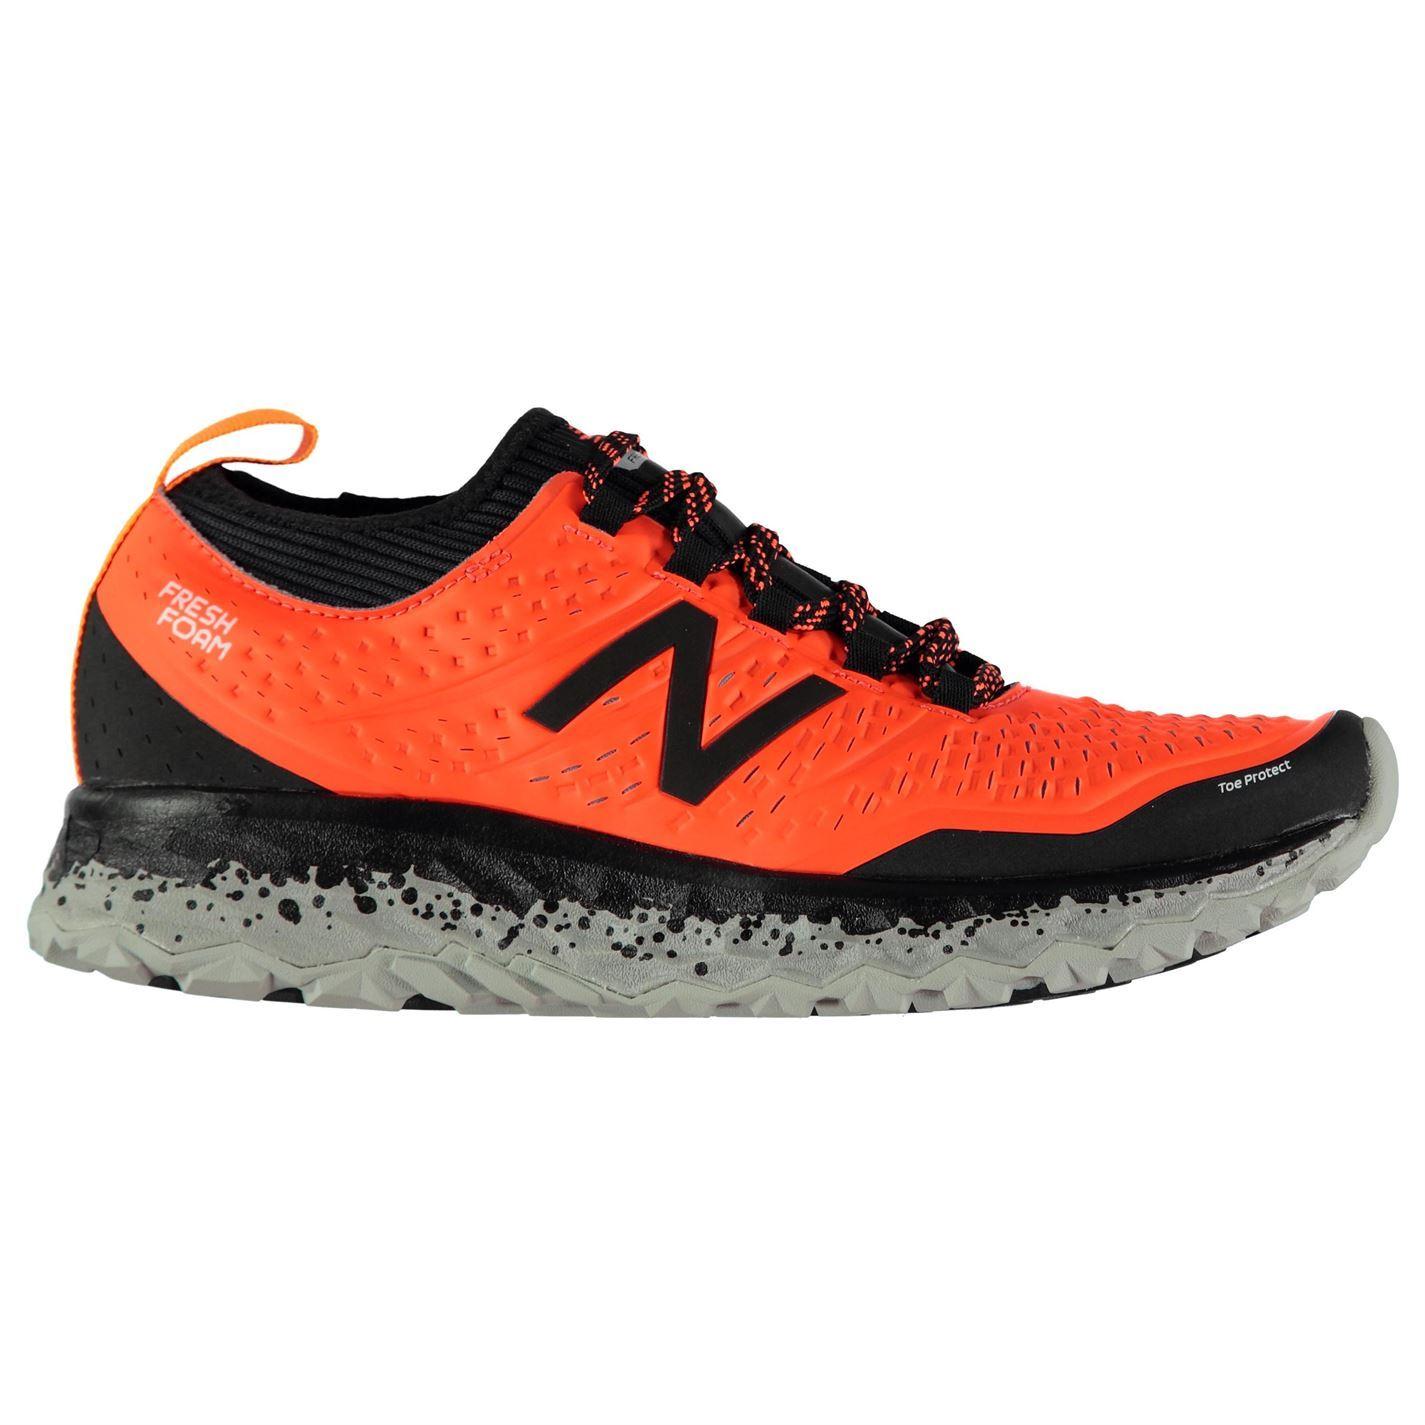 46189c22c6 Details about New Balance Mens Hierro V3 Trail Running Shoes Lightweight  Vibram